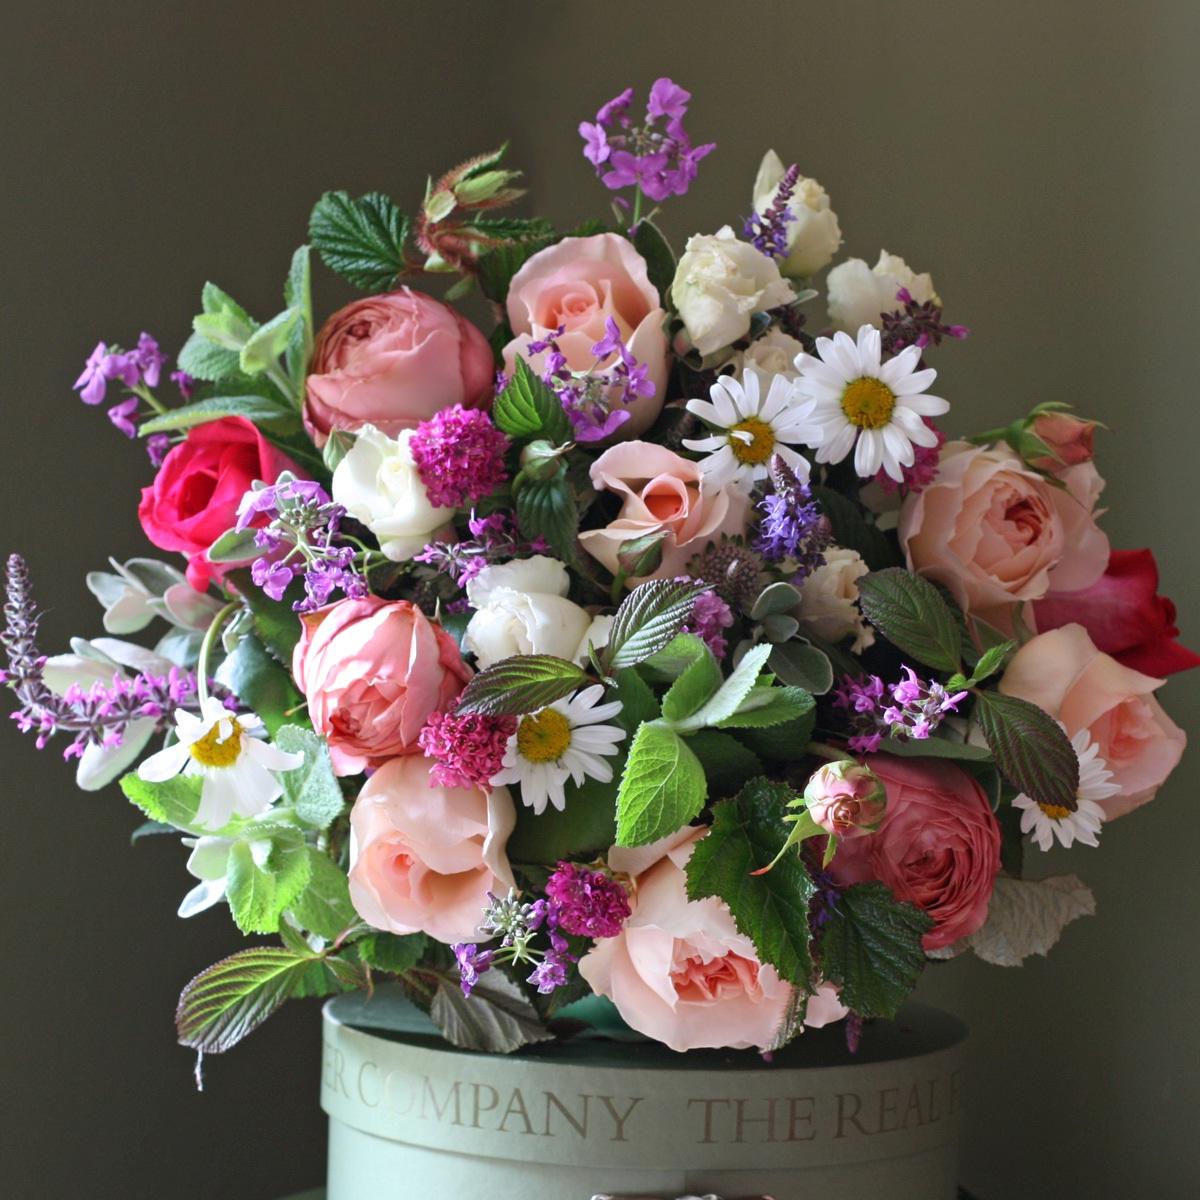 Real Flowers Company.jpg